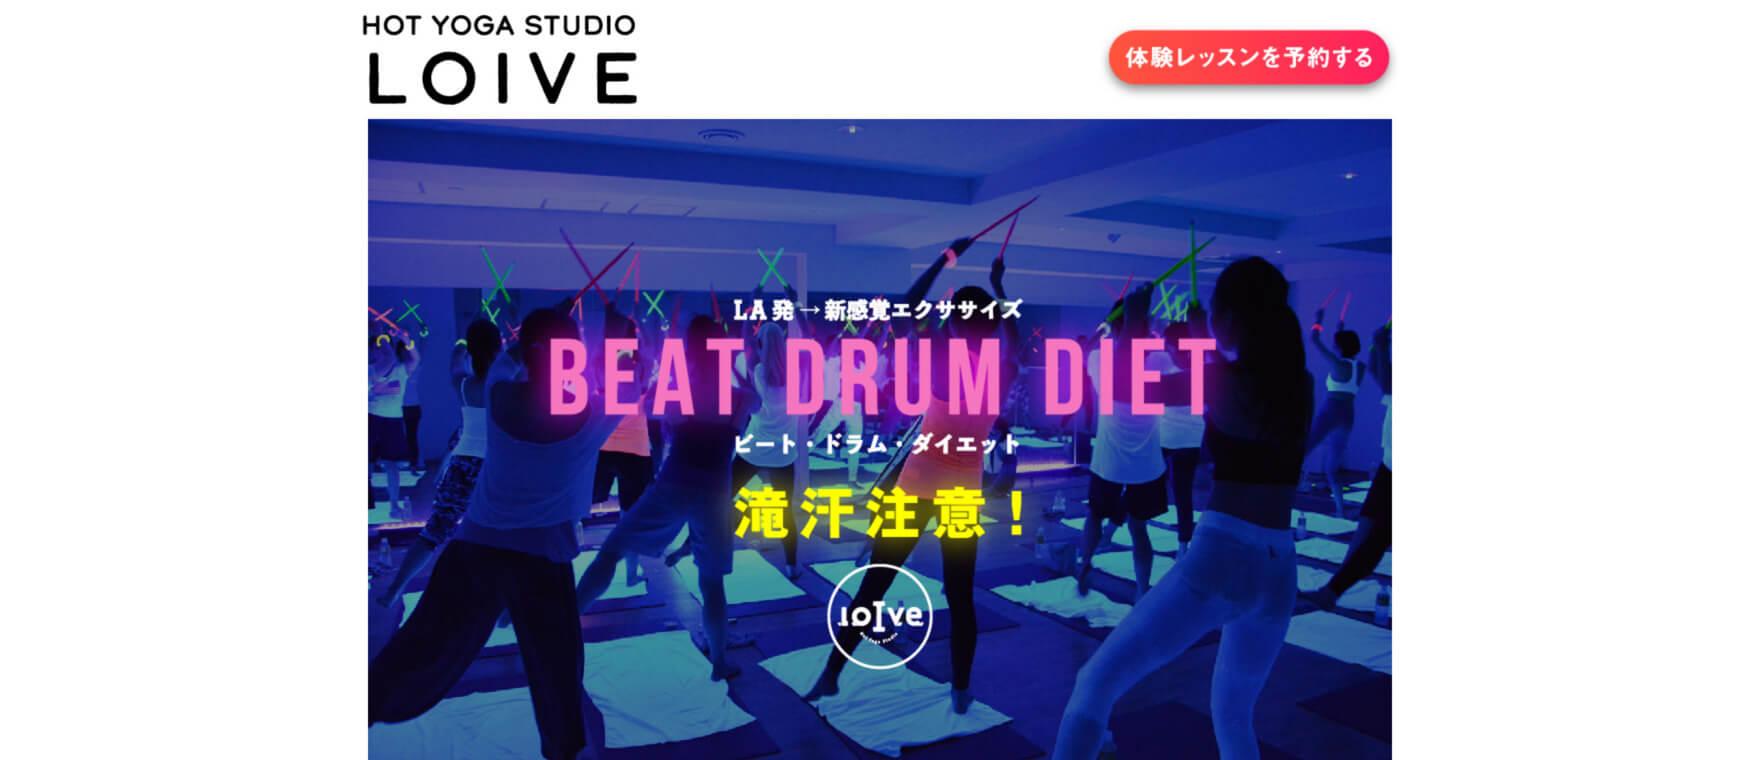 loIve岐阜店のイメージ画像